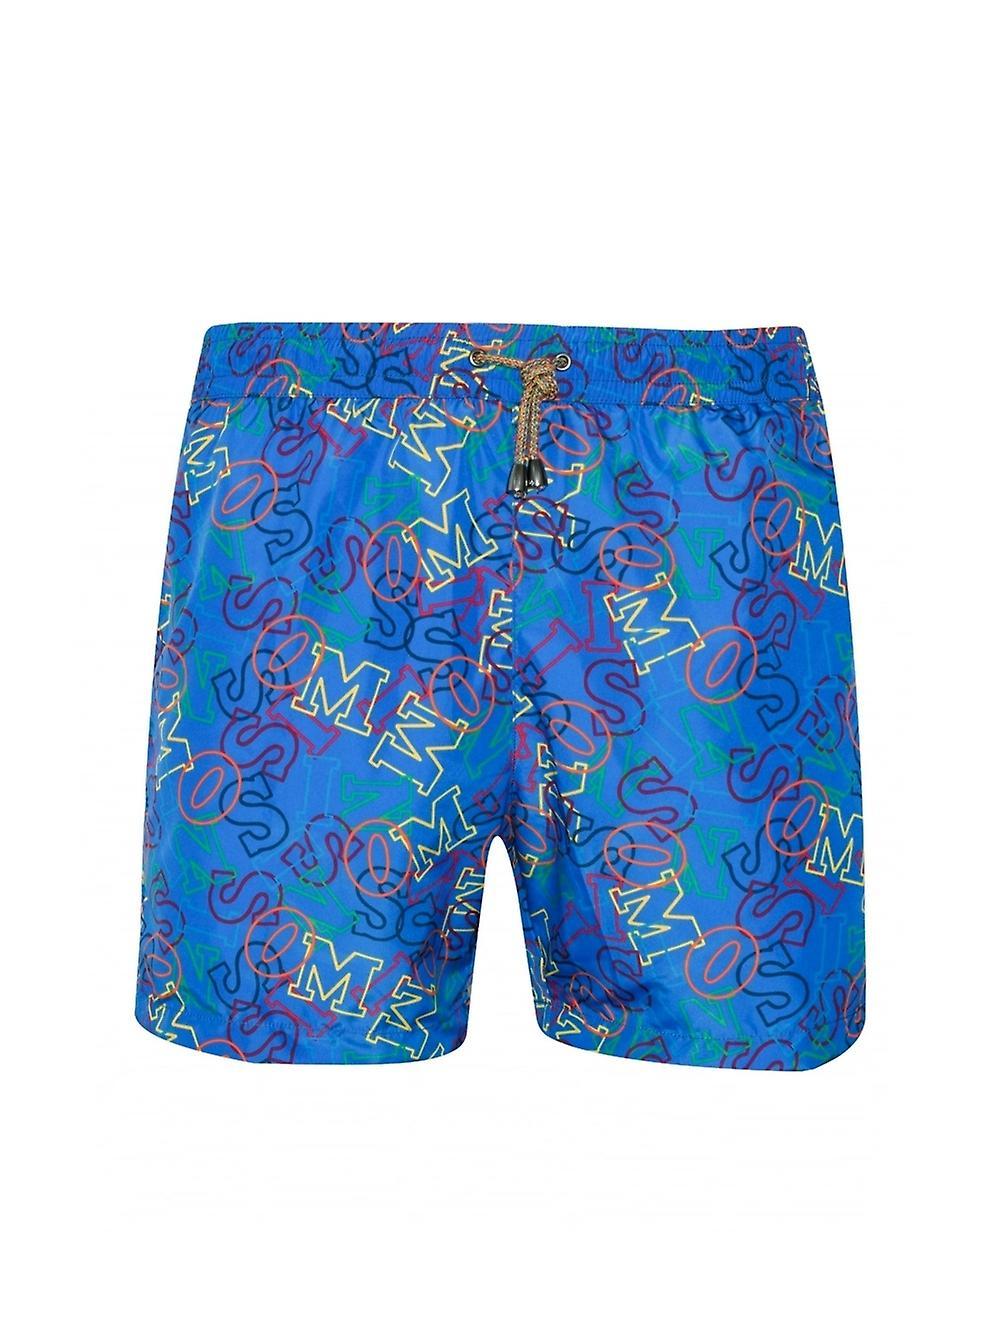 MISSONI Mare MISSONI Mare Royal bleu Logo Print Swim courtes